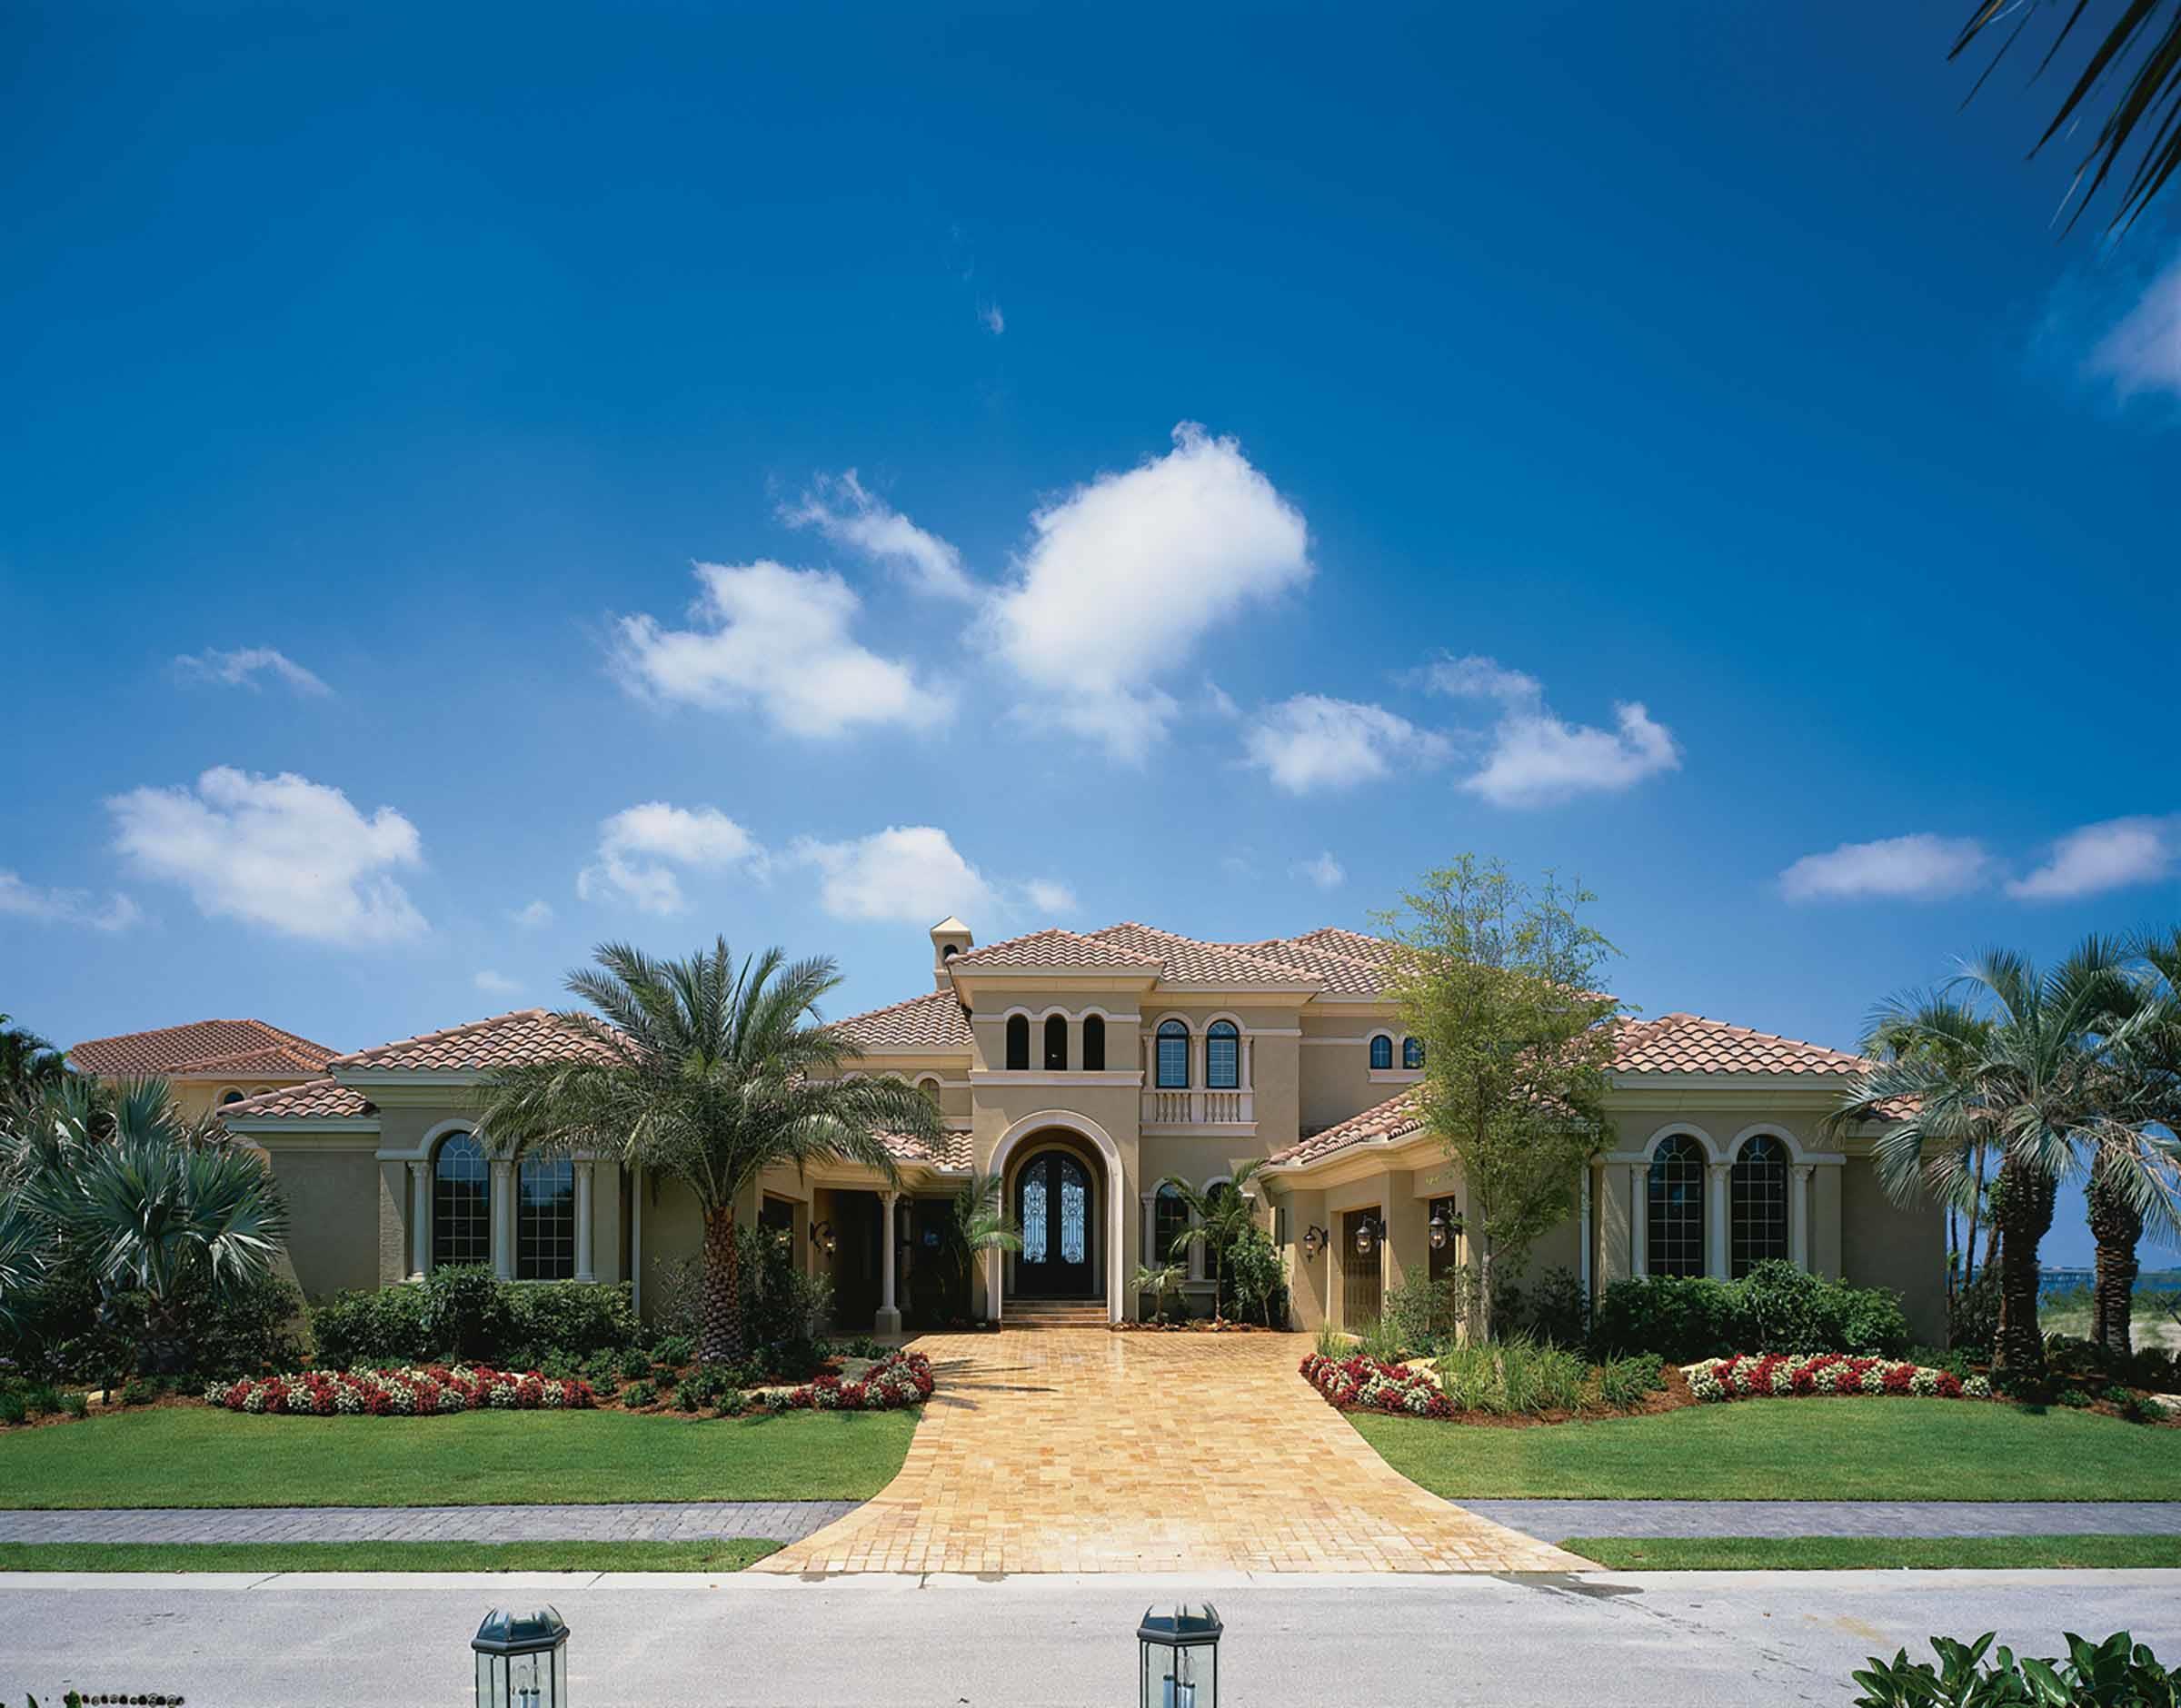 Tampa FL Real Estate, Call Us 813 294 4464 Or Email Vinchris7@aol.com